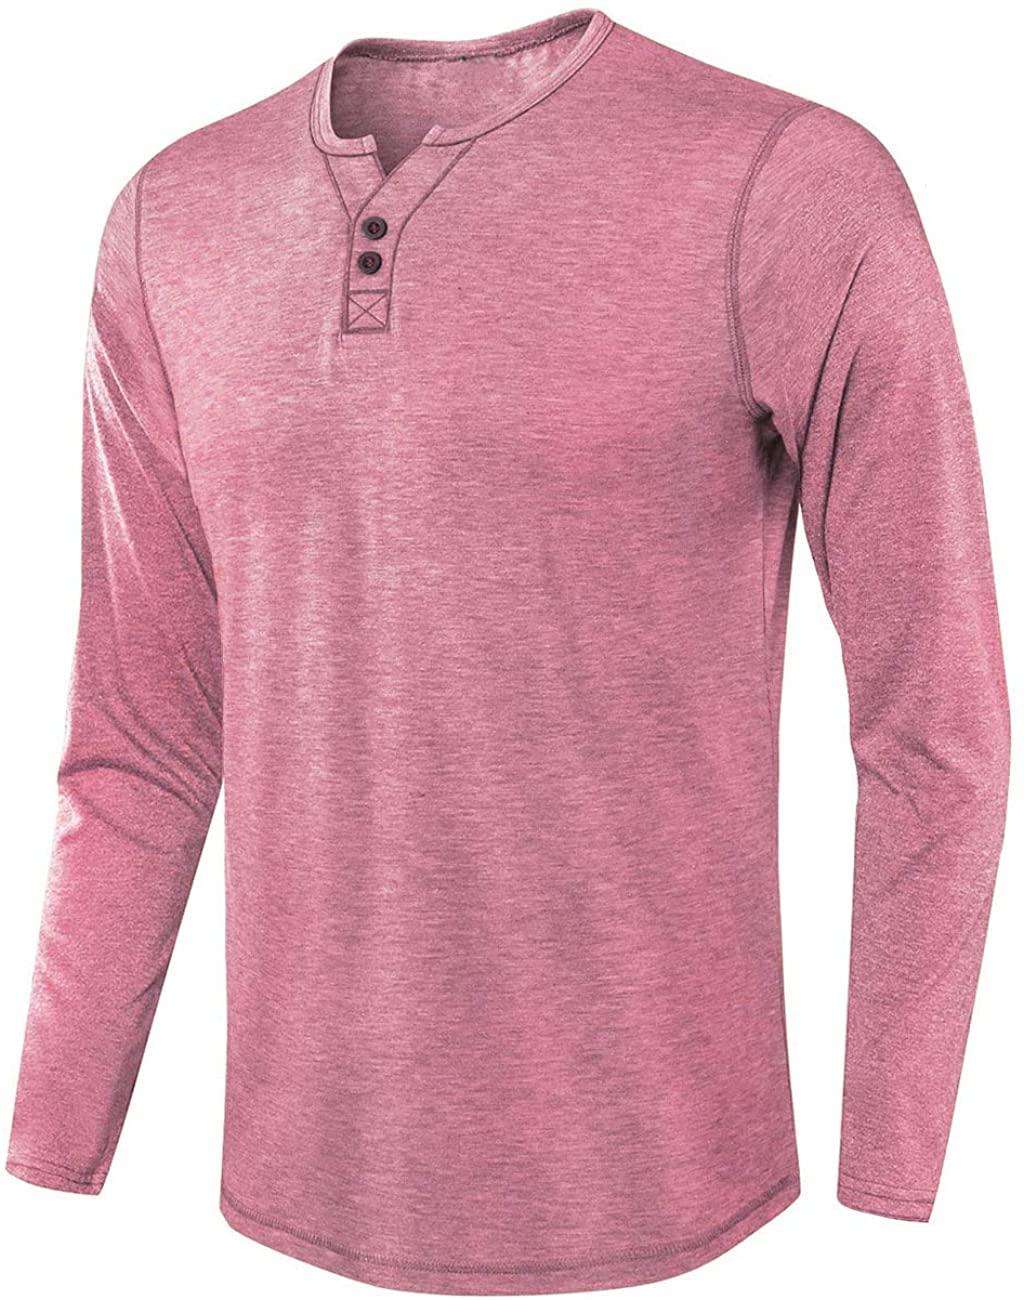 ZHPUAT Men's Slub Cotton Henley Shirt Regular-Fit Lightweight Basic T-Shirt with Long Sleeves